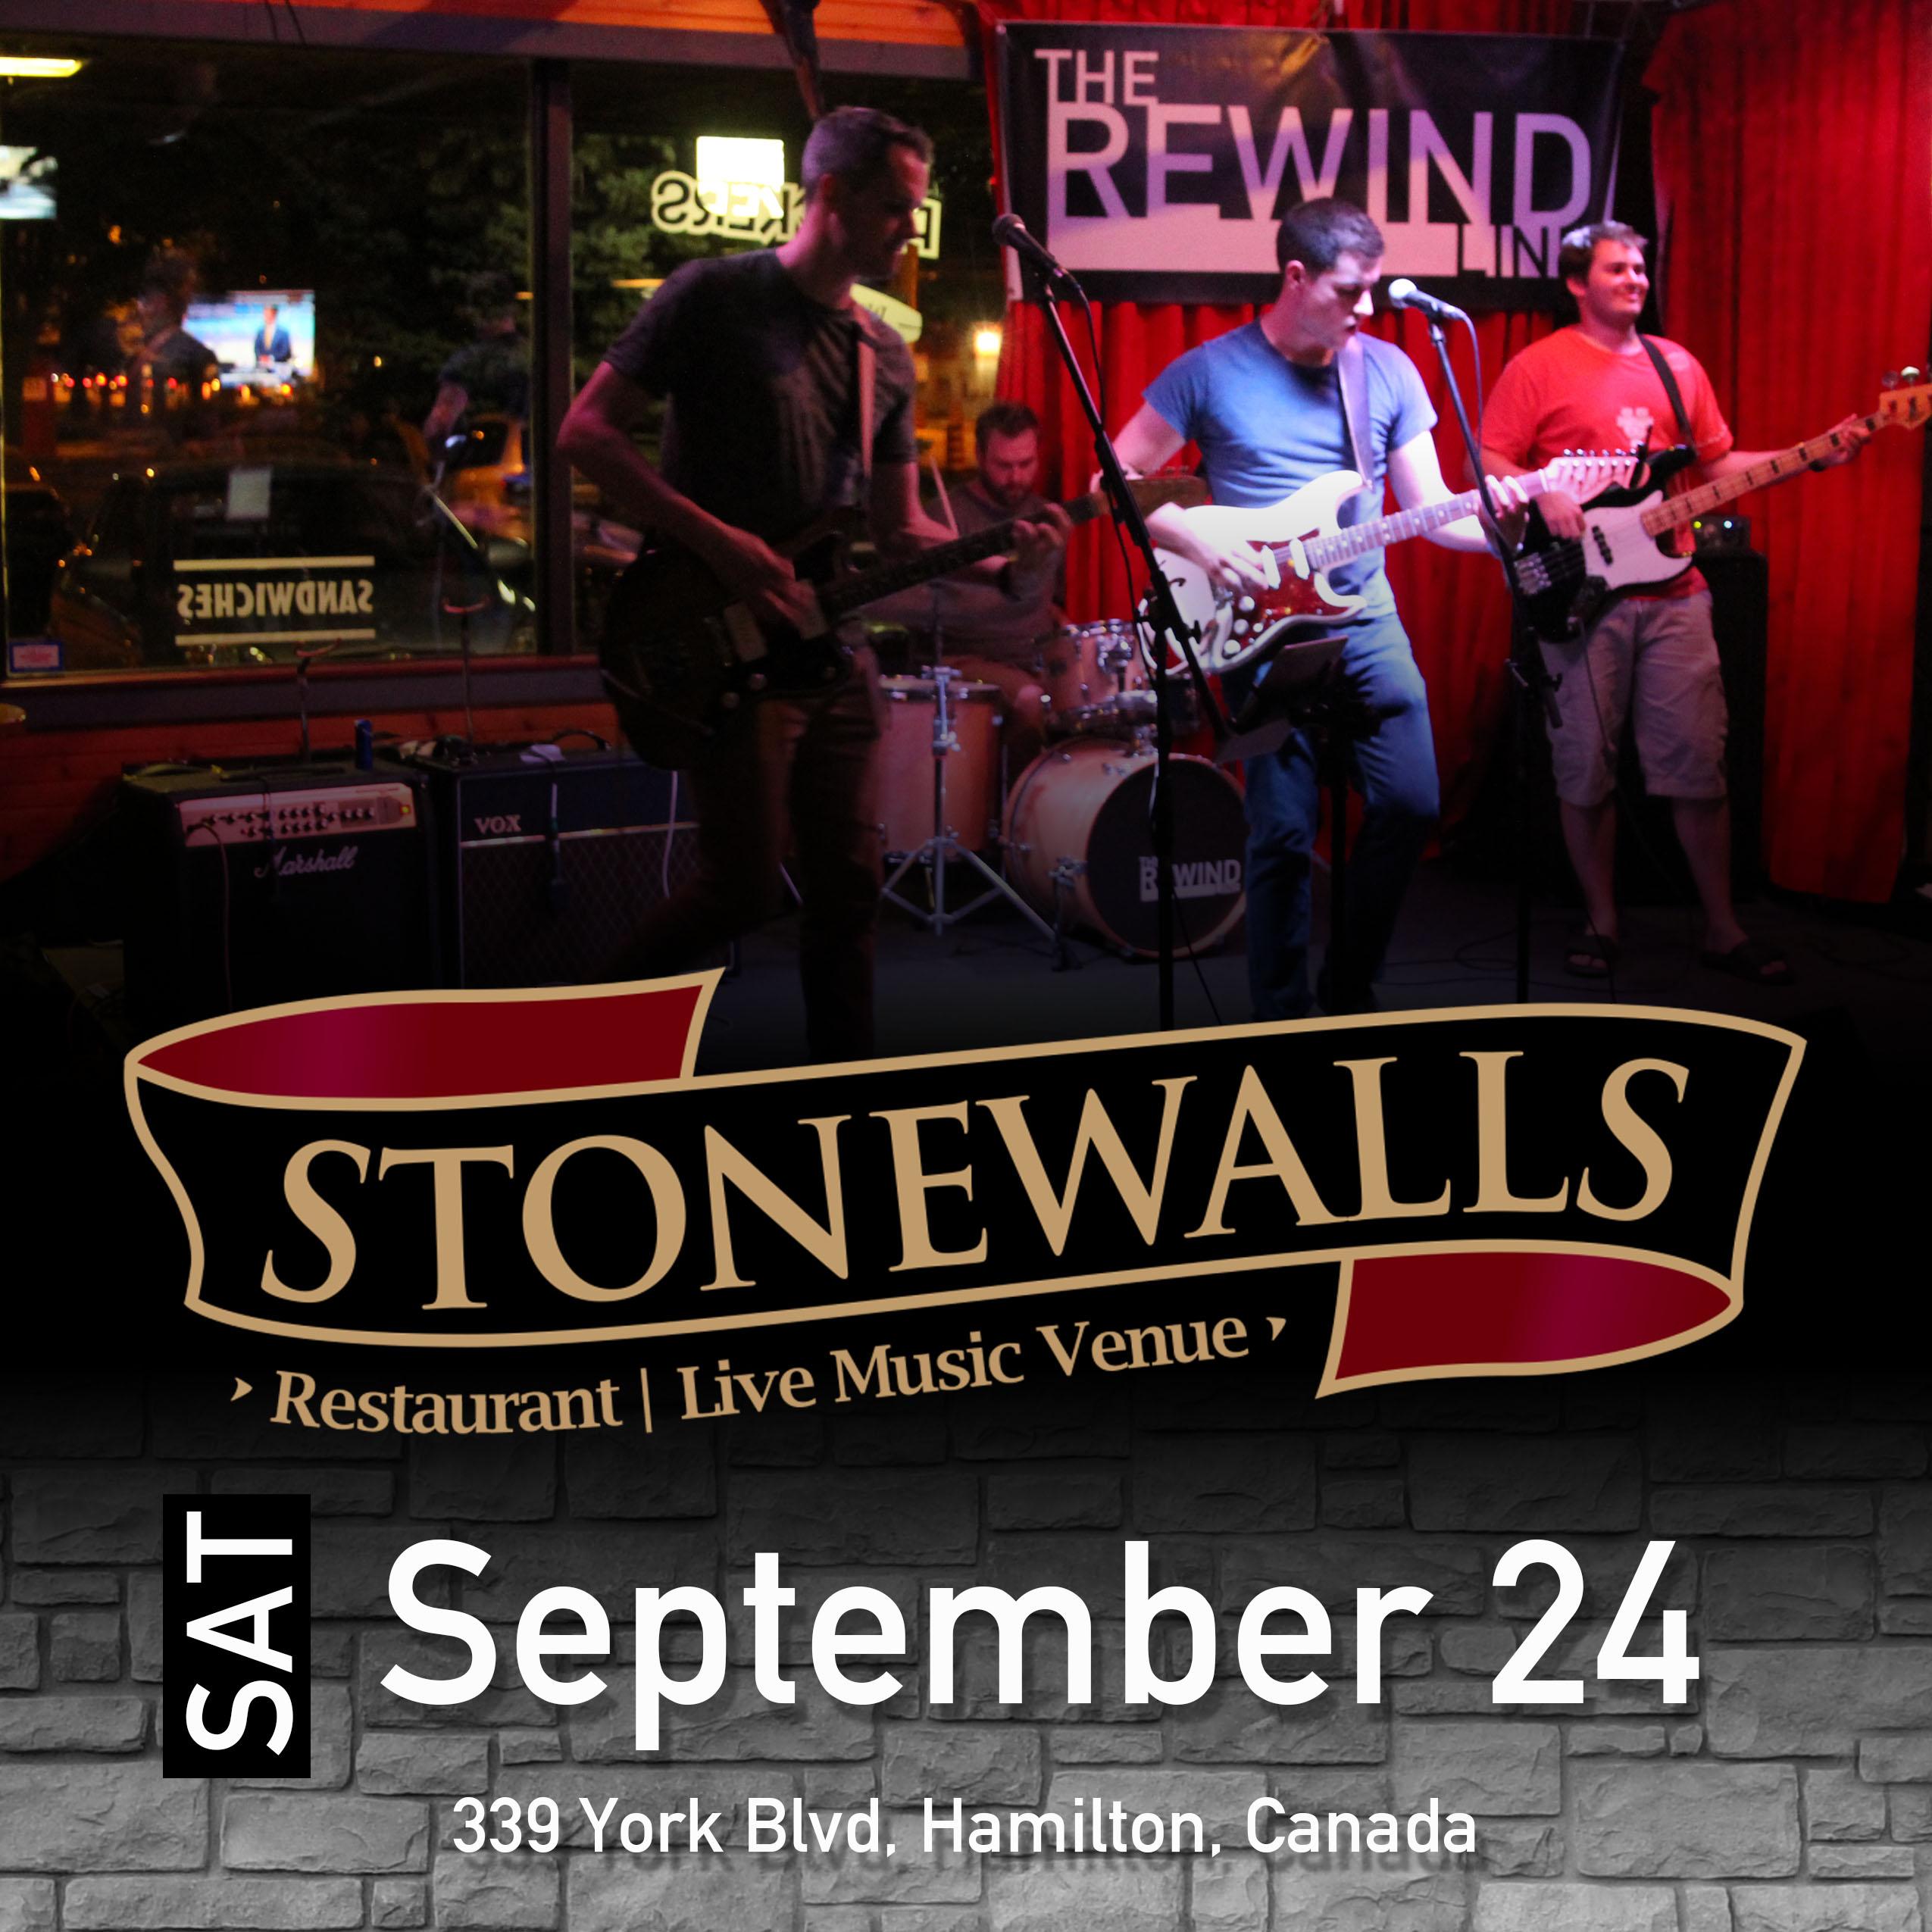 Sept 24 Stonewalls